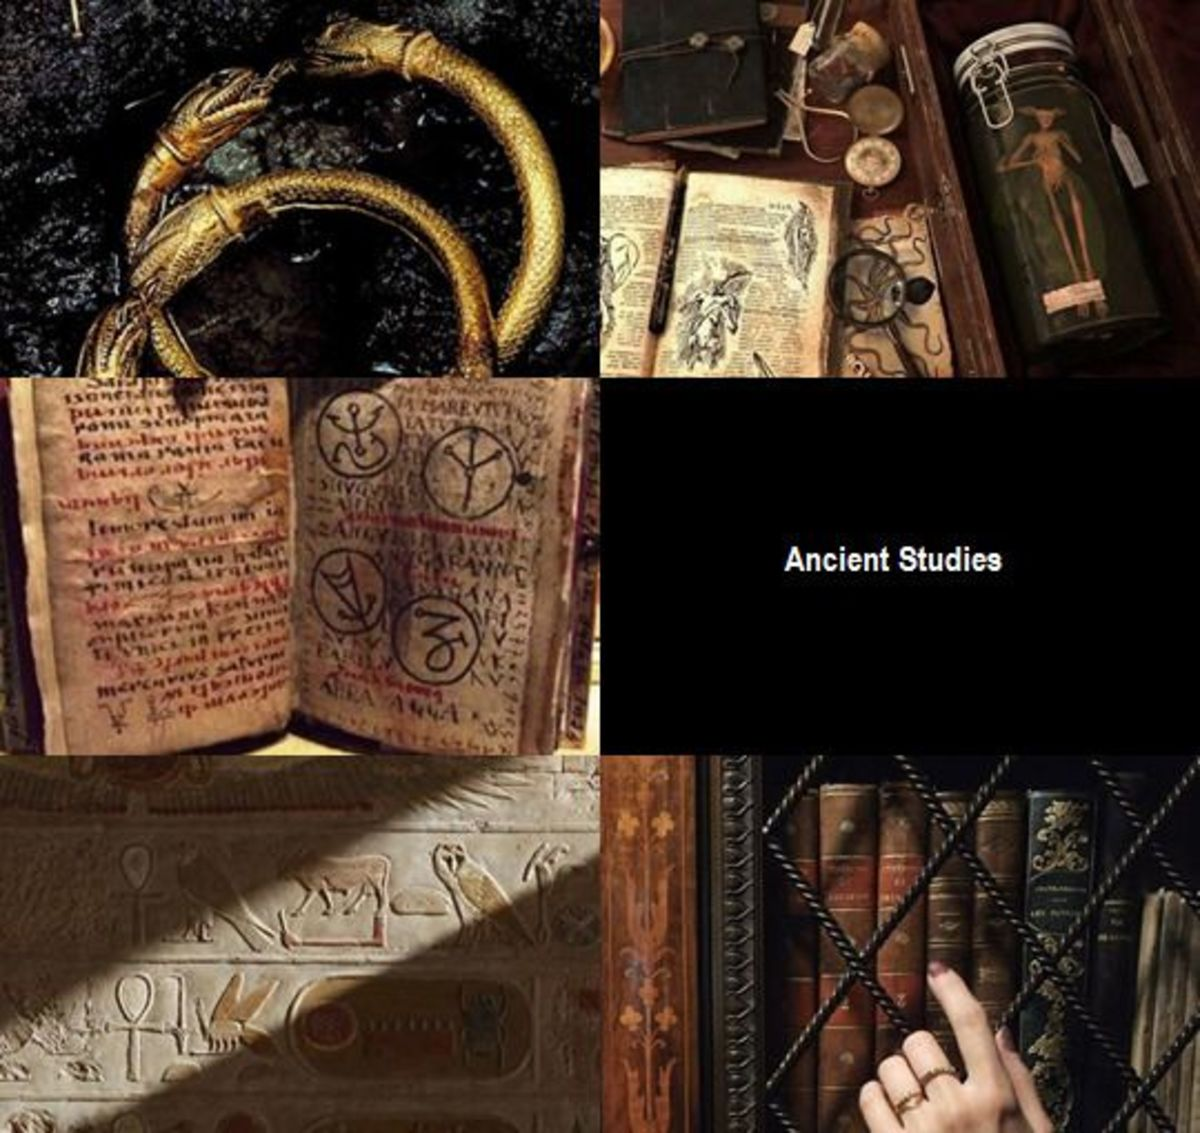 Ancient Studies in Harry Potter